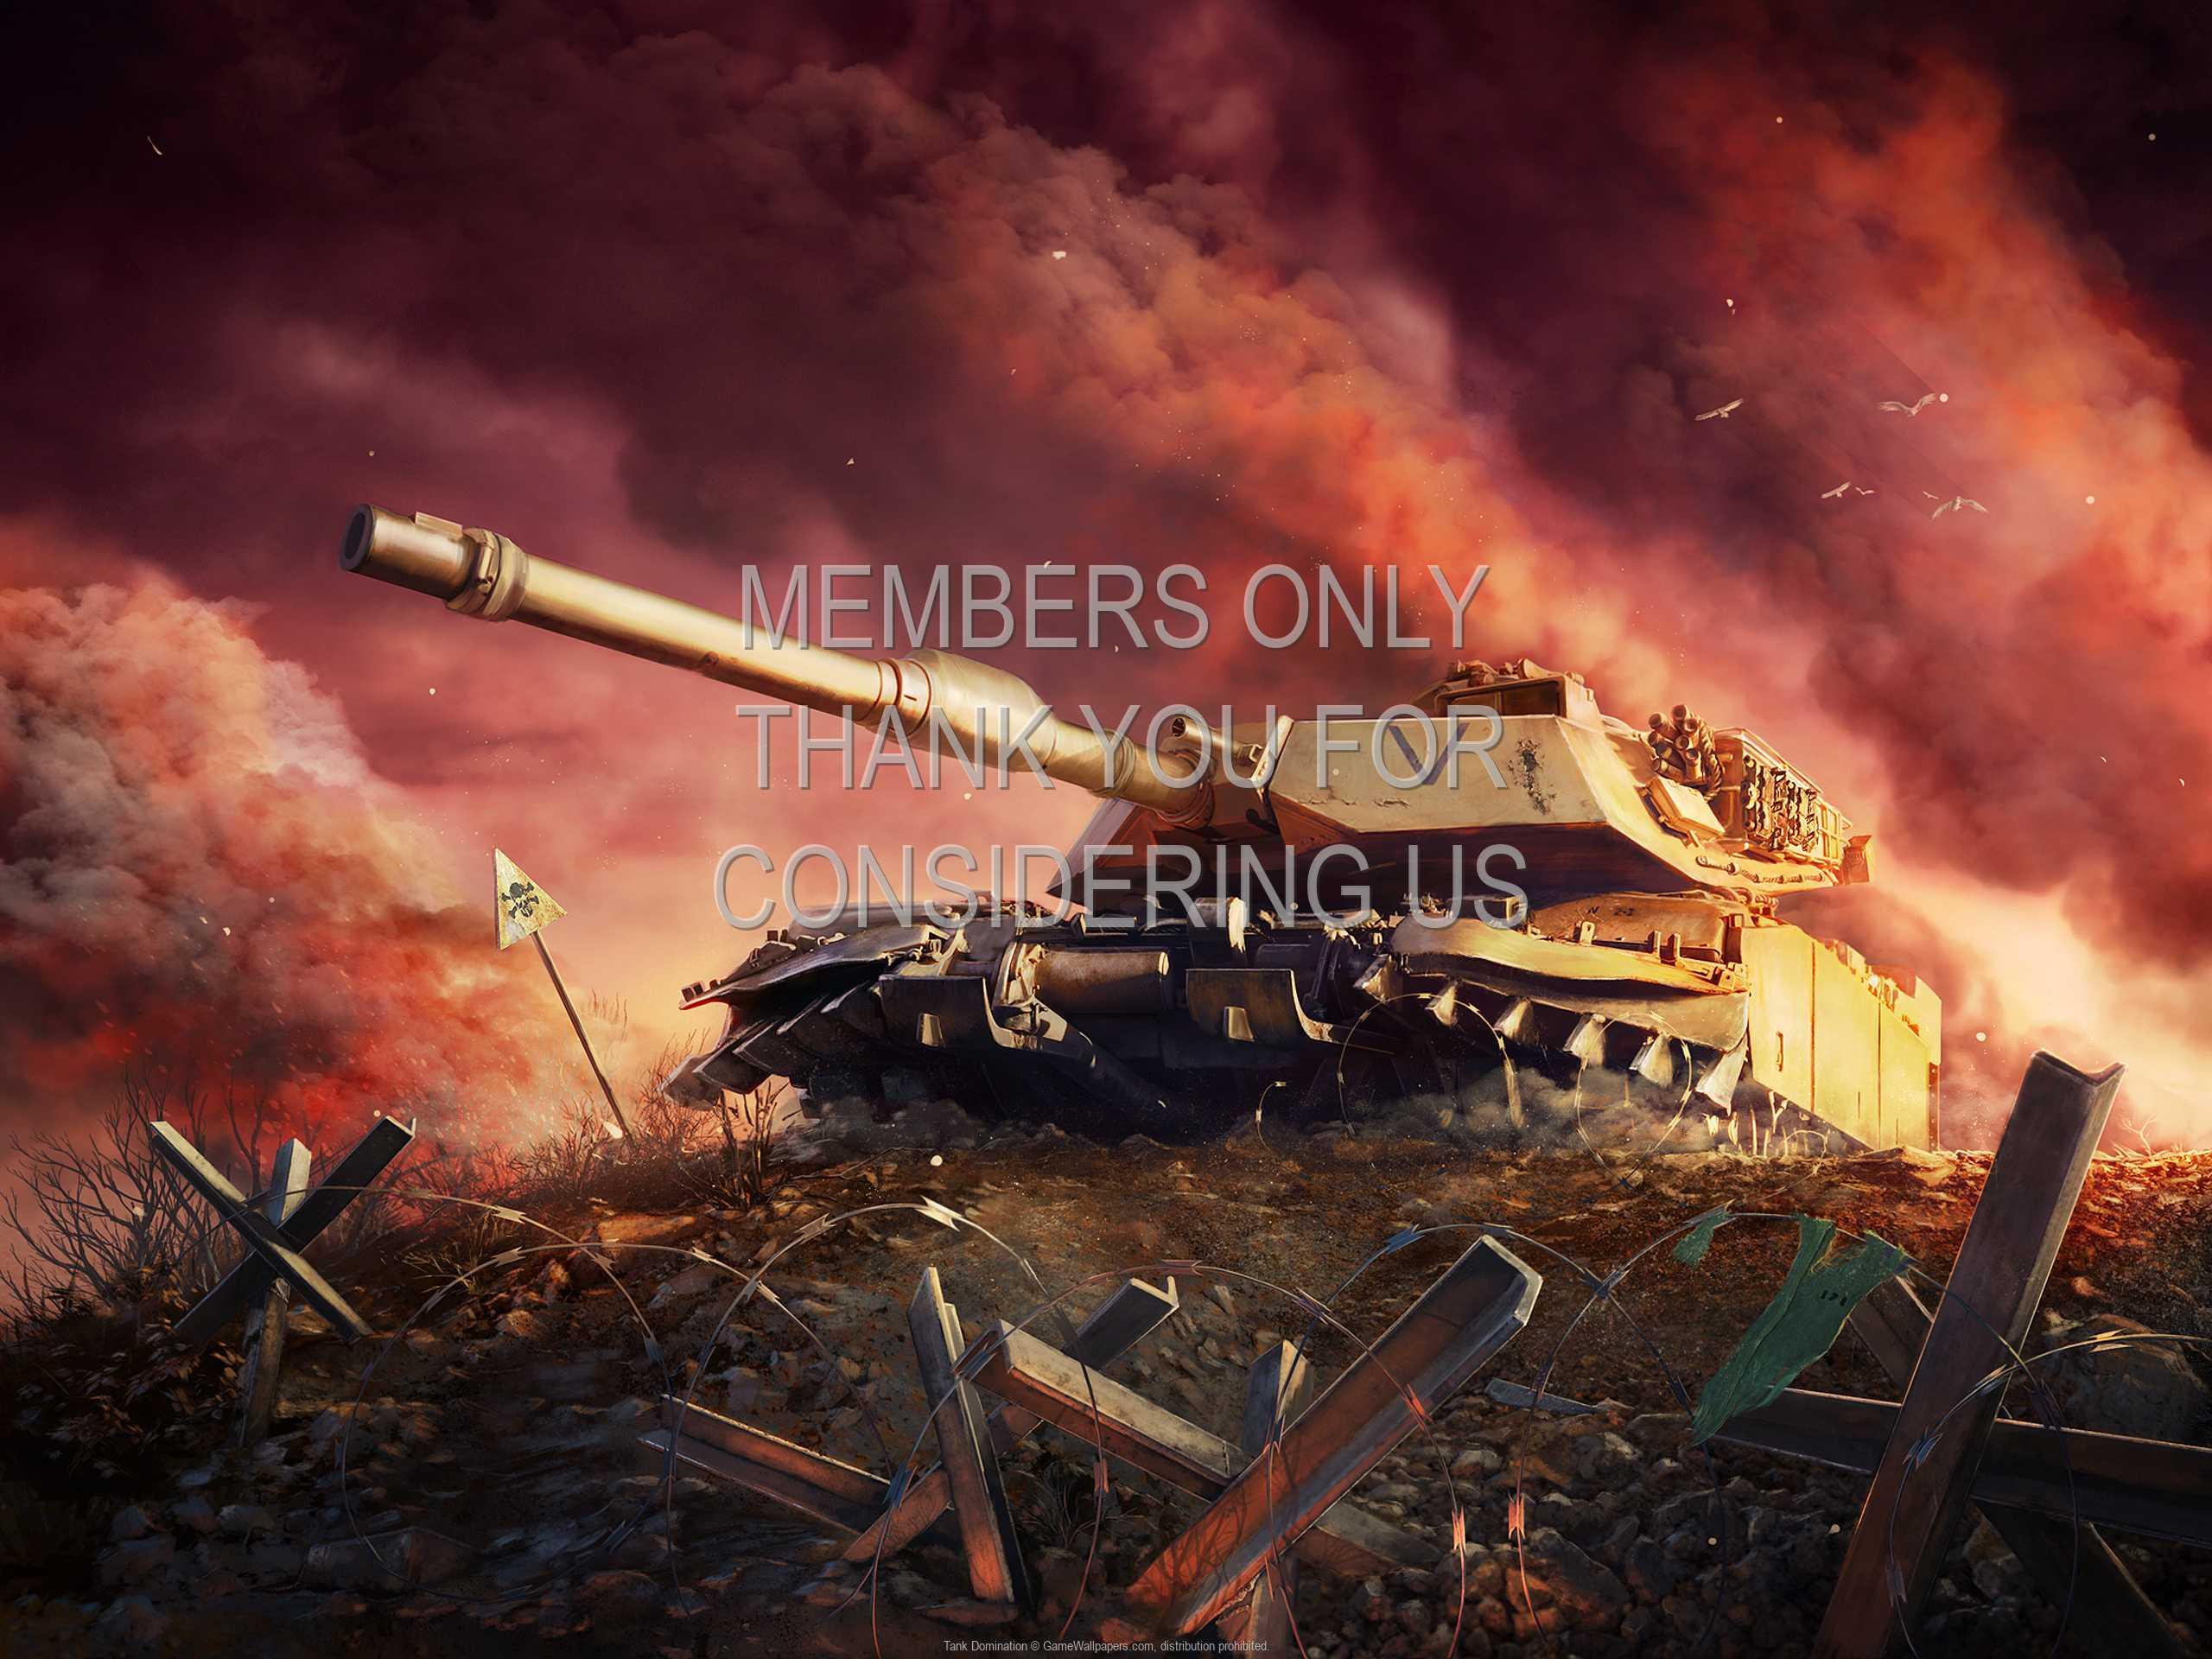 Tank Domination 1080p Horizontal Mobile wallpaper or background 01